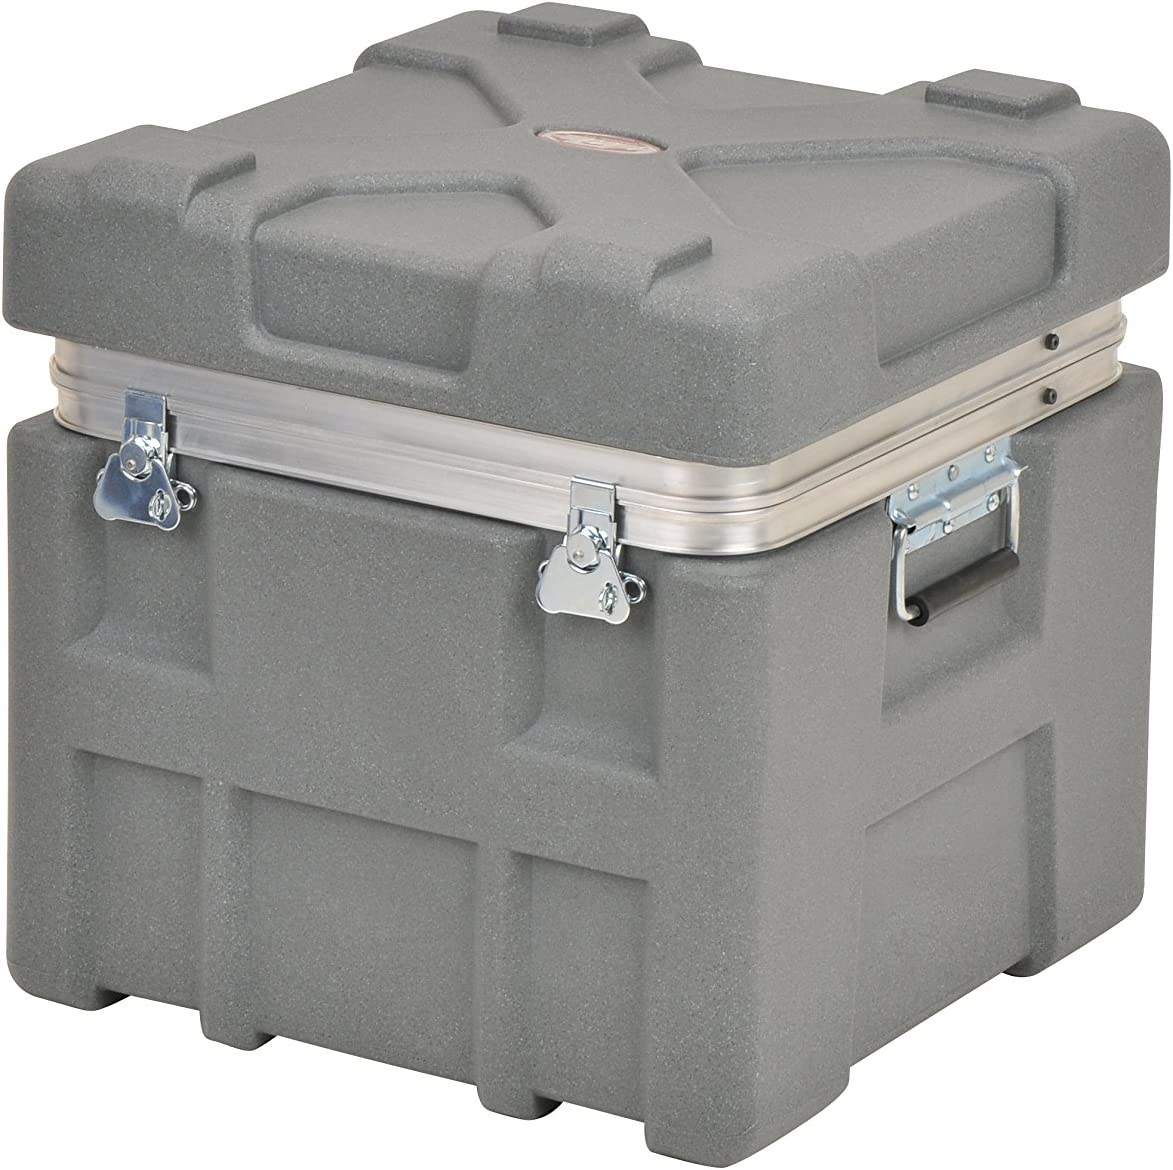 SKB Equipment Case 24 15 Sales El Paso Mall for sale X 10